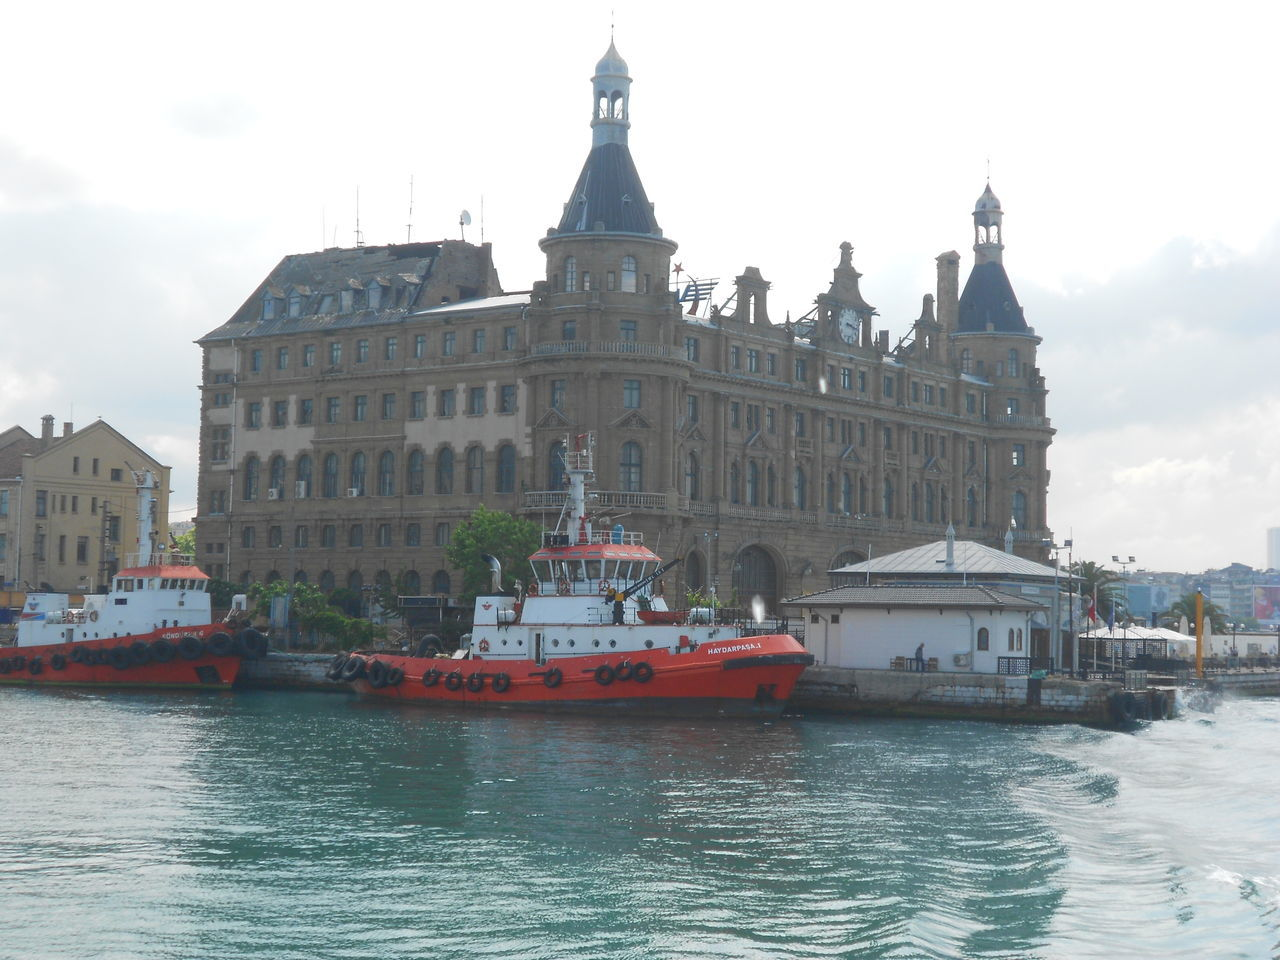 #Awesome_shots #photoedit #photowall #picoftoday #photooftheday #ipopyou #instagamous #beautiful #instagramhub #igaddict #jj_for #charmingcity #clouds  #istanbul #istanbul #turkiye #old #oldbuildings #sea #ship #sky #Turkey Haydarpaşa Garı